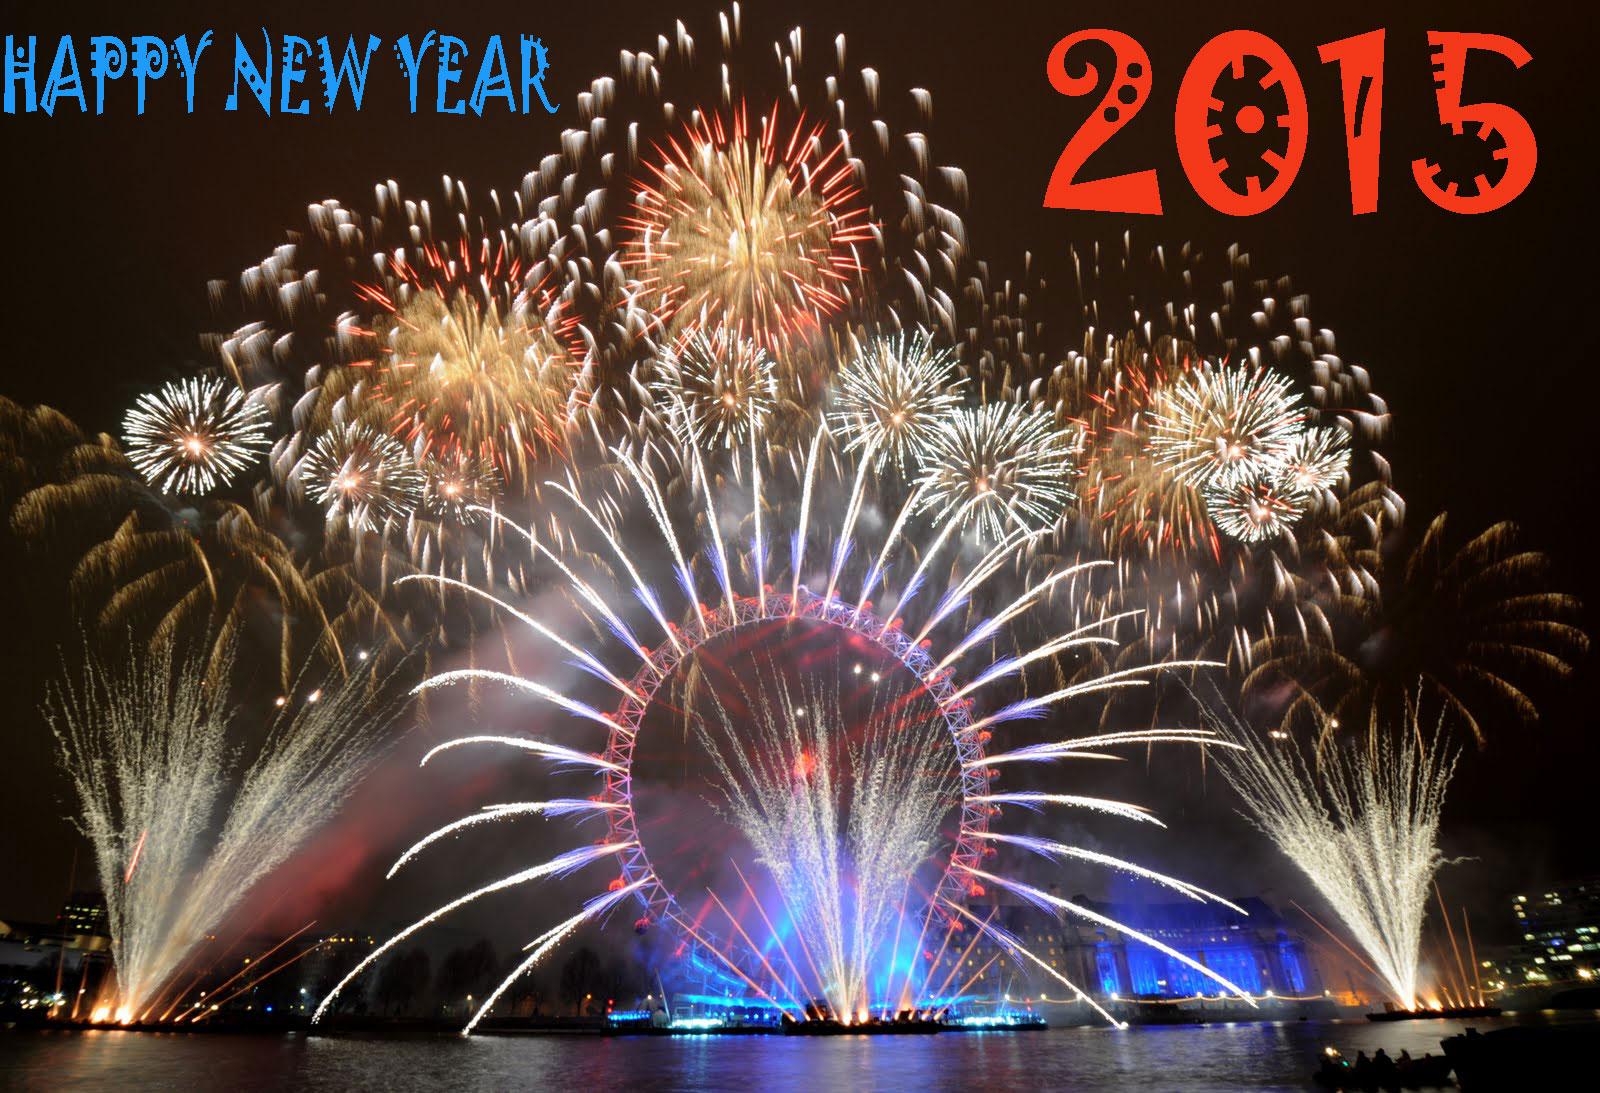 Happy New Year 2015 Desktop Background Wallpapers   Unique Wallpaper 1600x1093